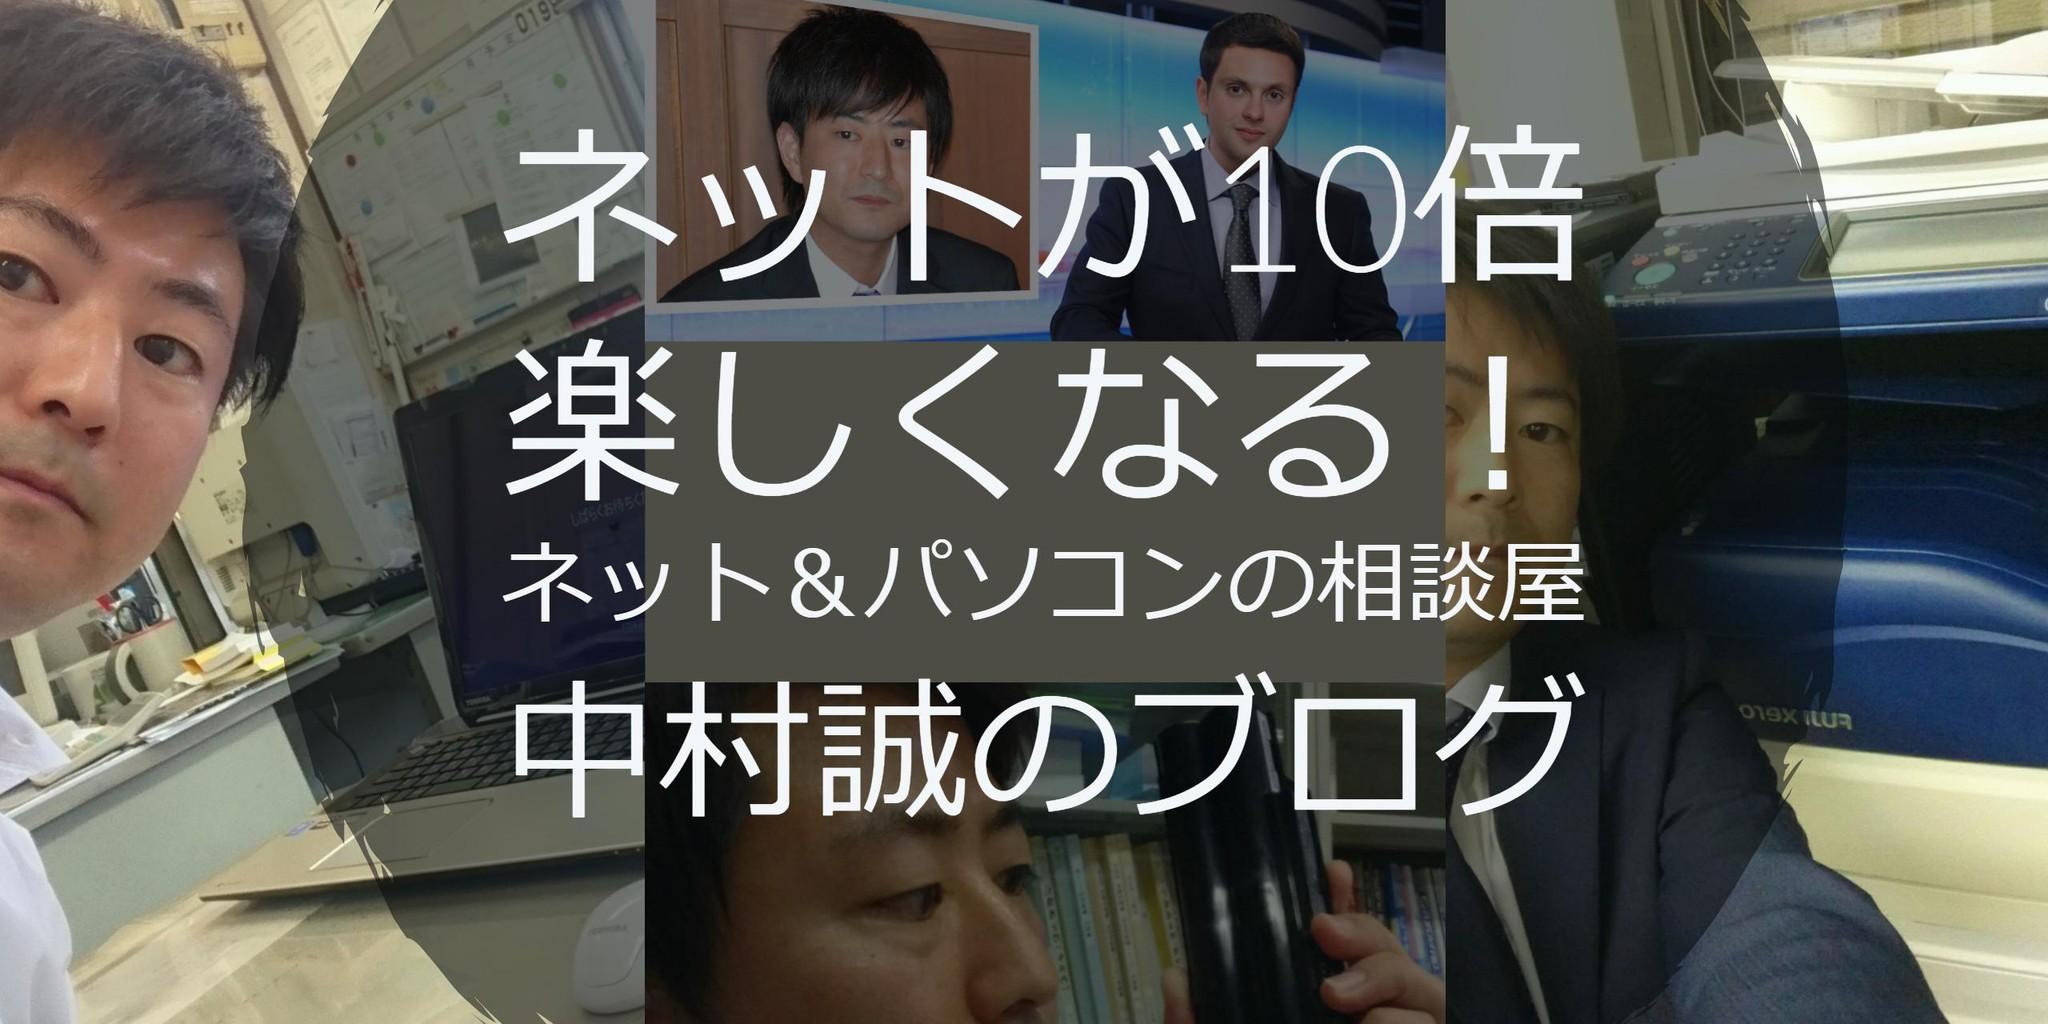 ITで仕事をもっと効率化!オフィスのトータルアドバイザー中村誠のブログ イメージ画像